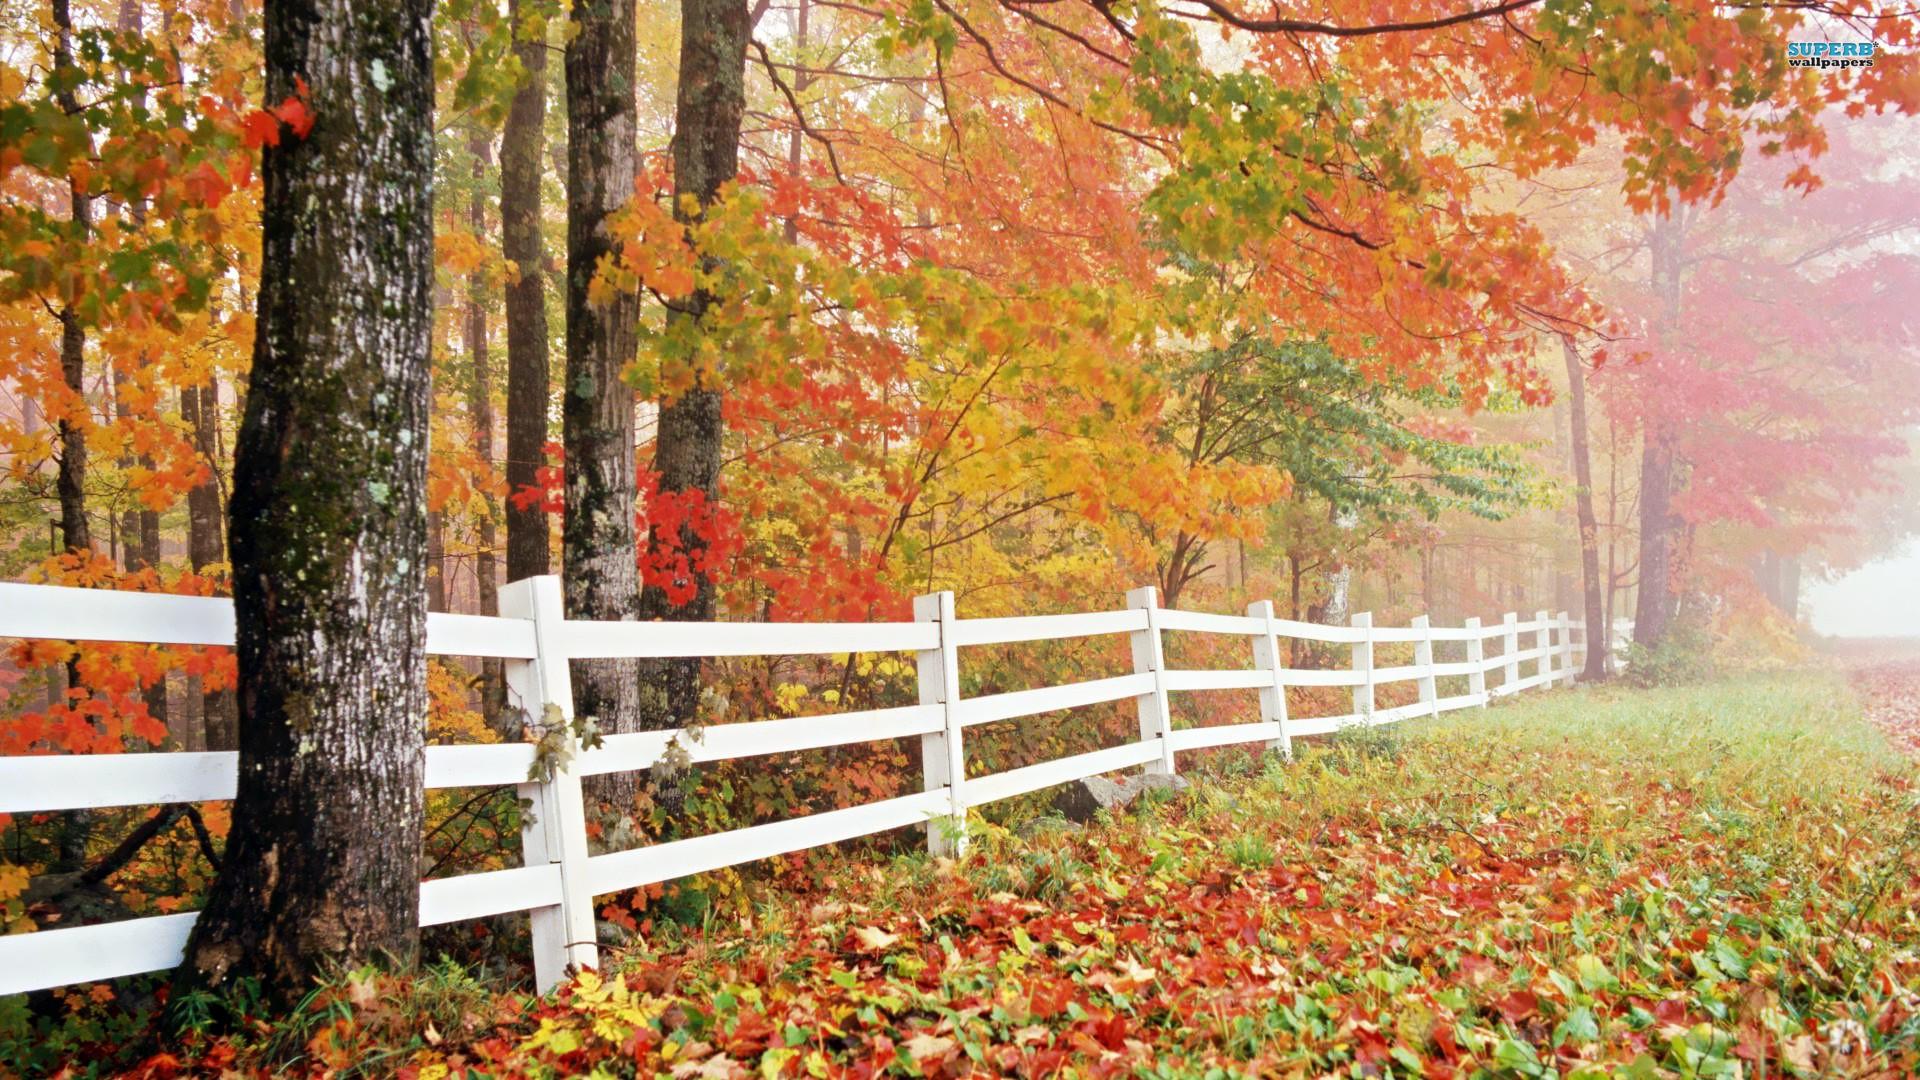 Nature Wallpaper Autumn Free 1 Desktop Wallpapers Hd Windows 10 Wallpaper Hd Autumn 261294 Hd Wallpaper Backgrounds Download